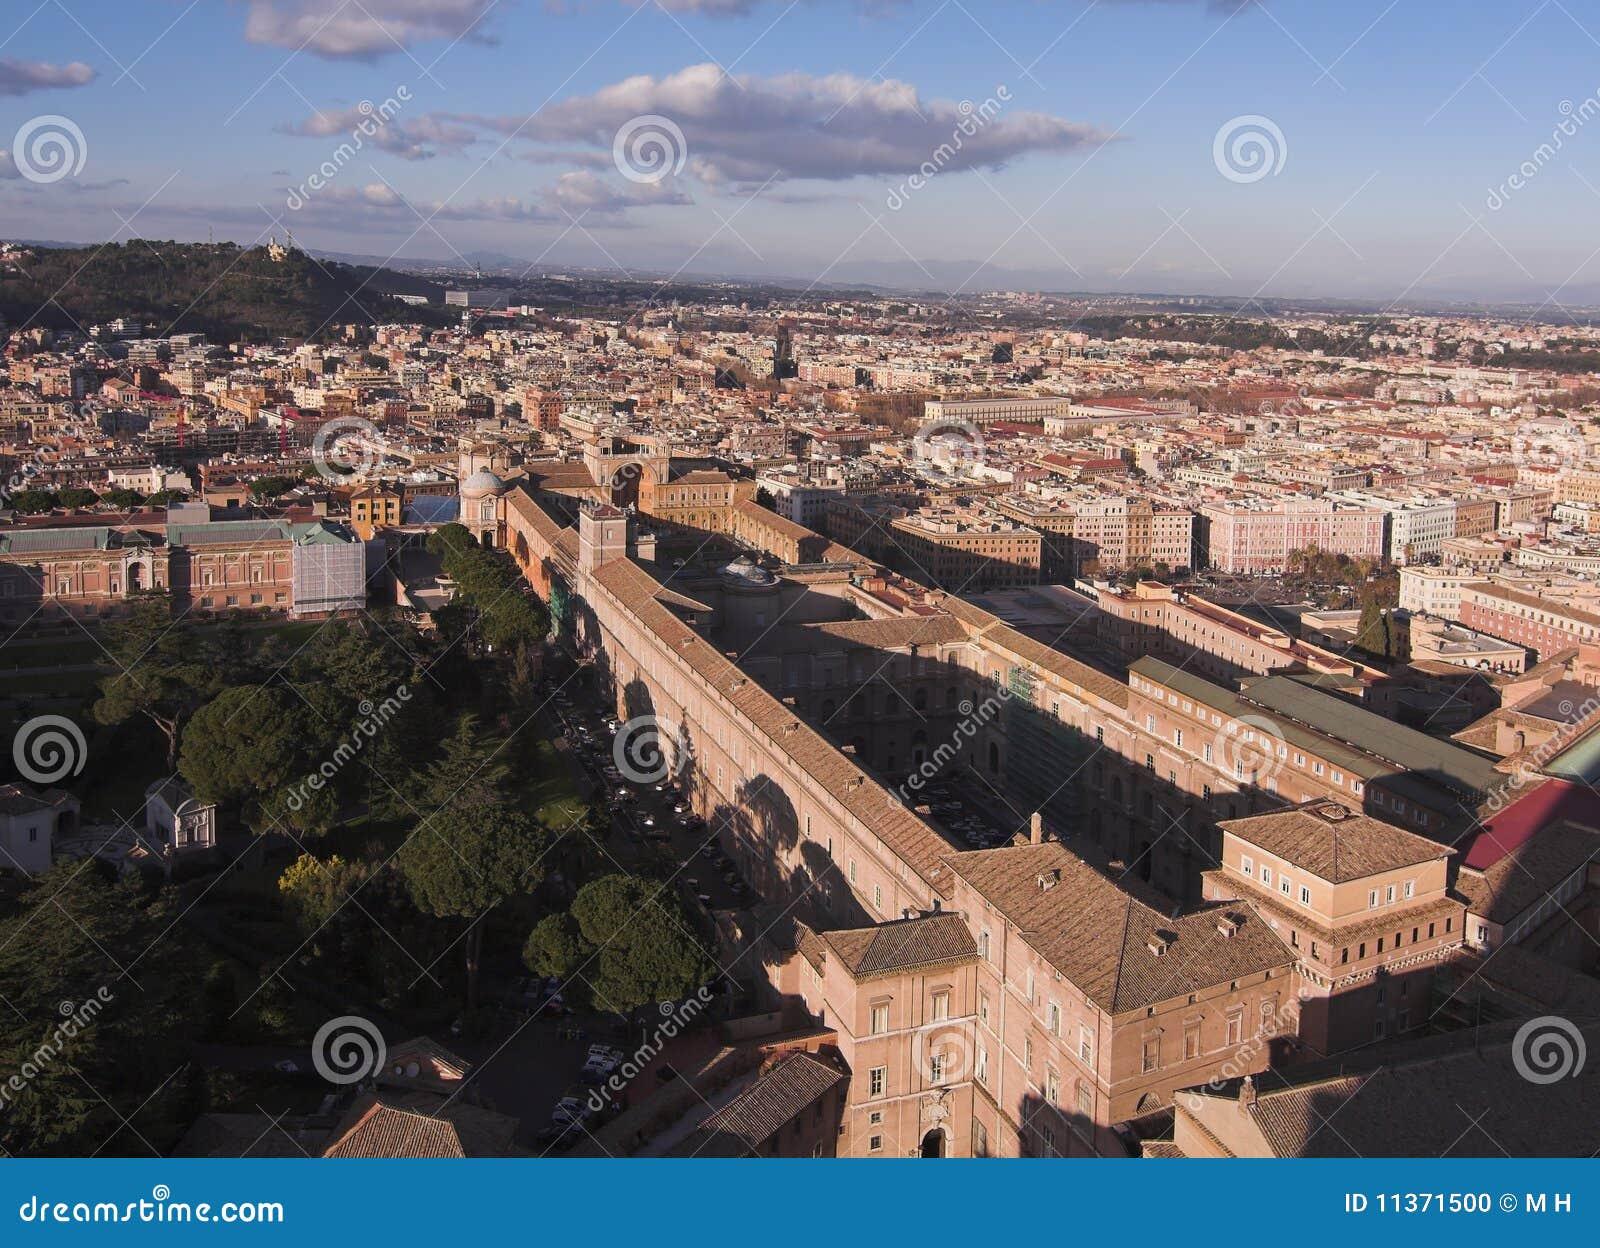 Muzea Vatican widok